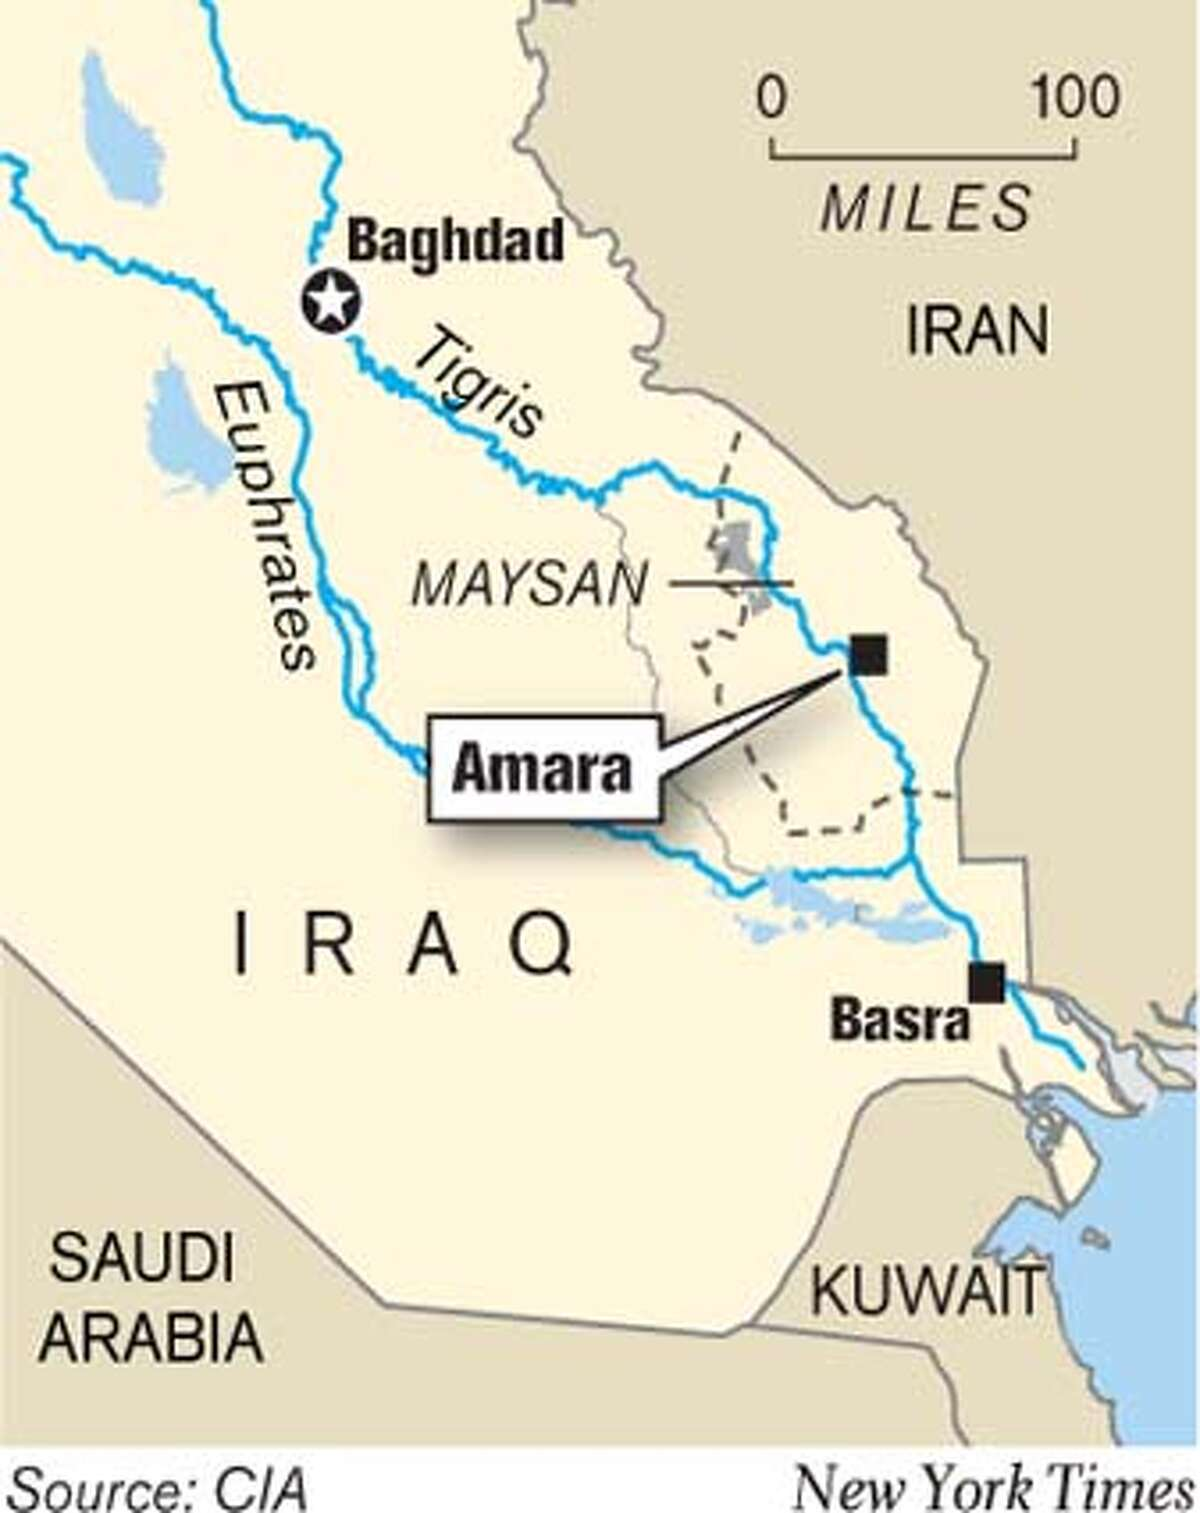 Amara. New York Times Graphic